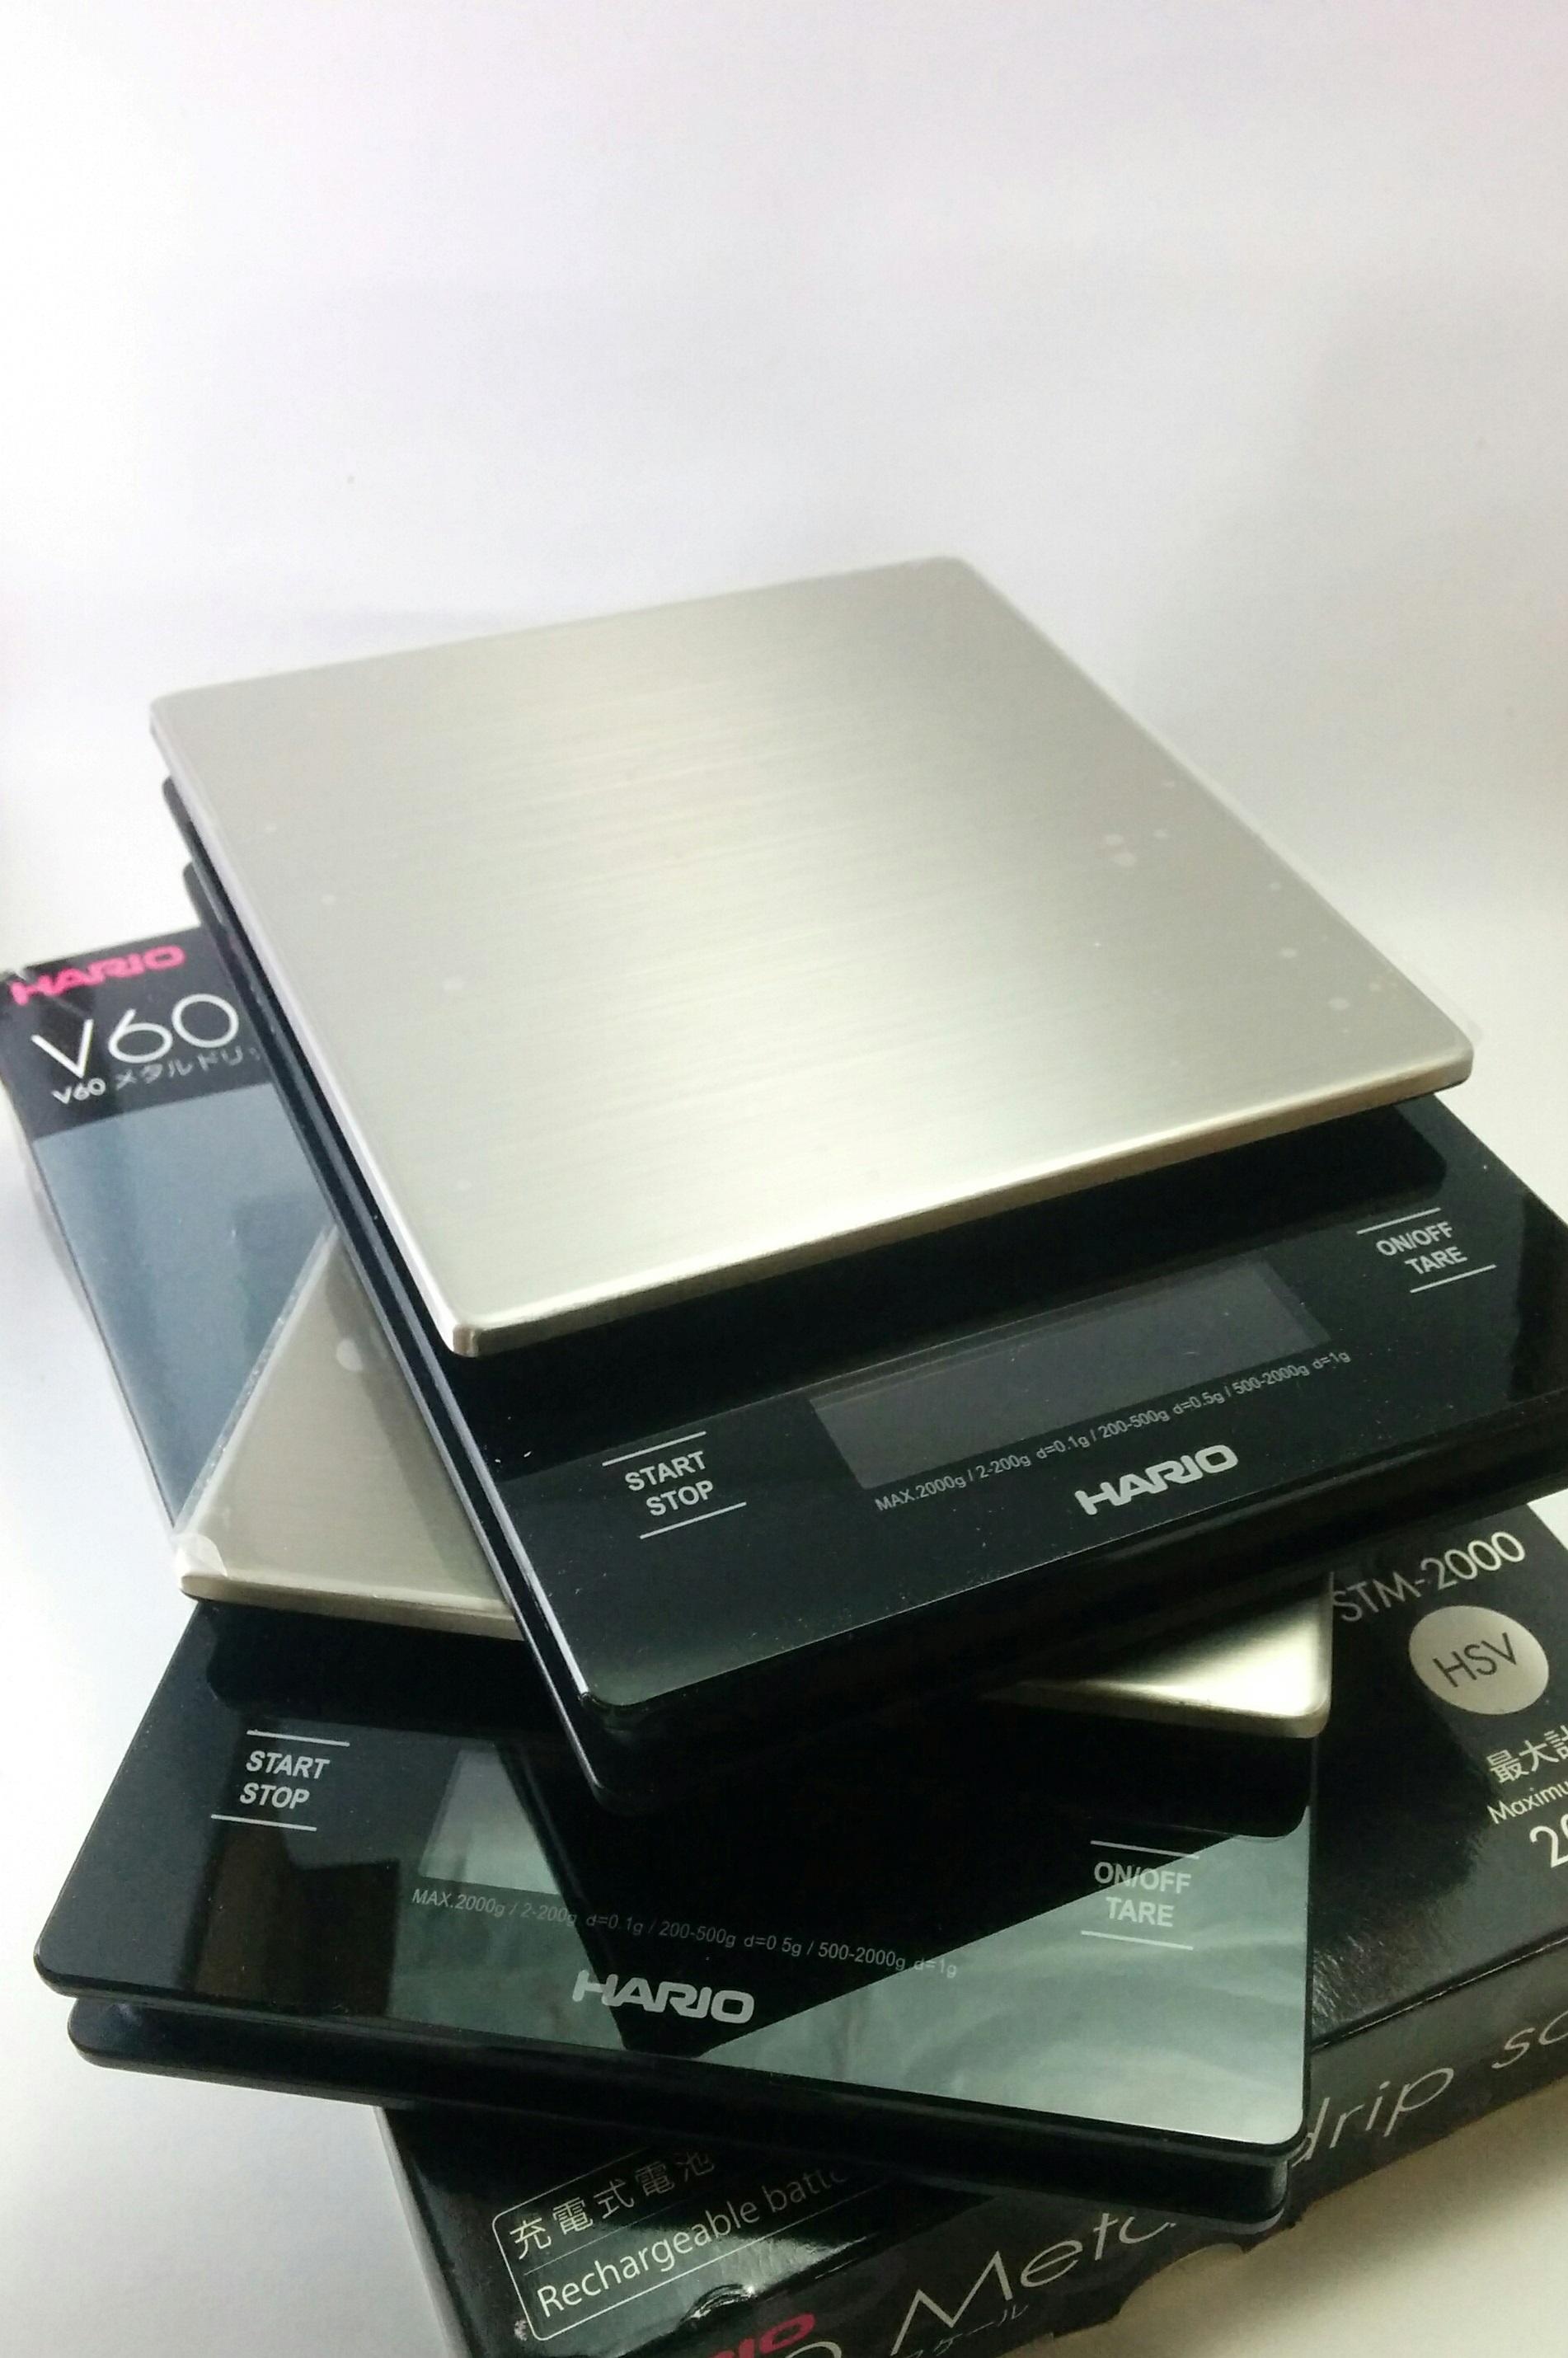 Jual Hario V60 Metal Drip Scale Timbangan Kopi Terbaik High Vstm 2000hsv Quality Coffee Tokopedia